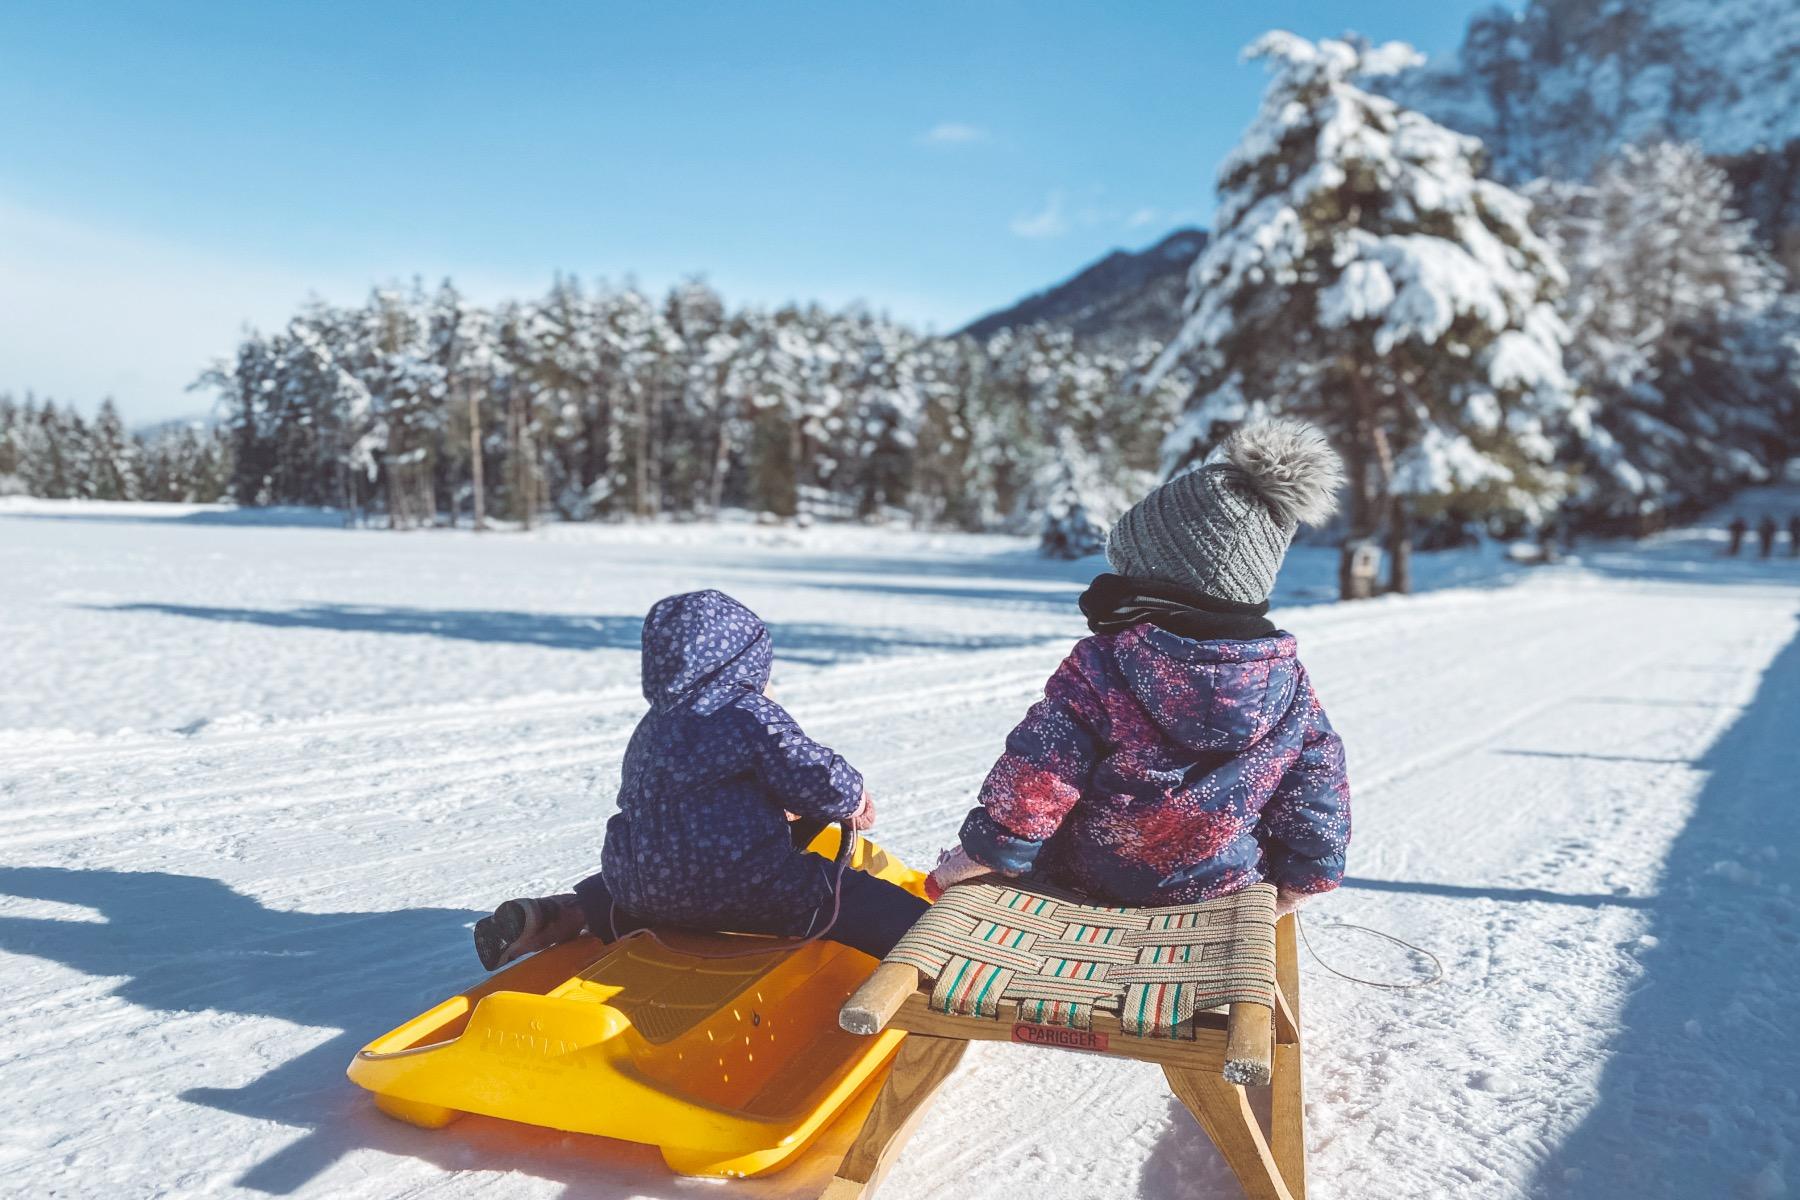 Fit trotz Schnee rodeln